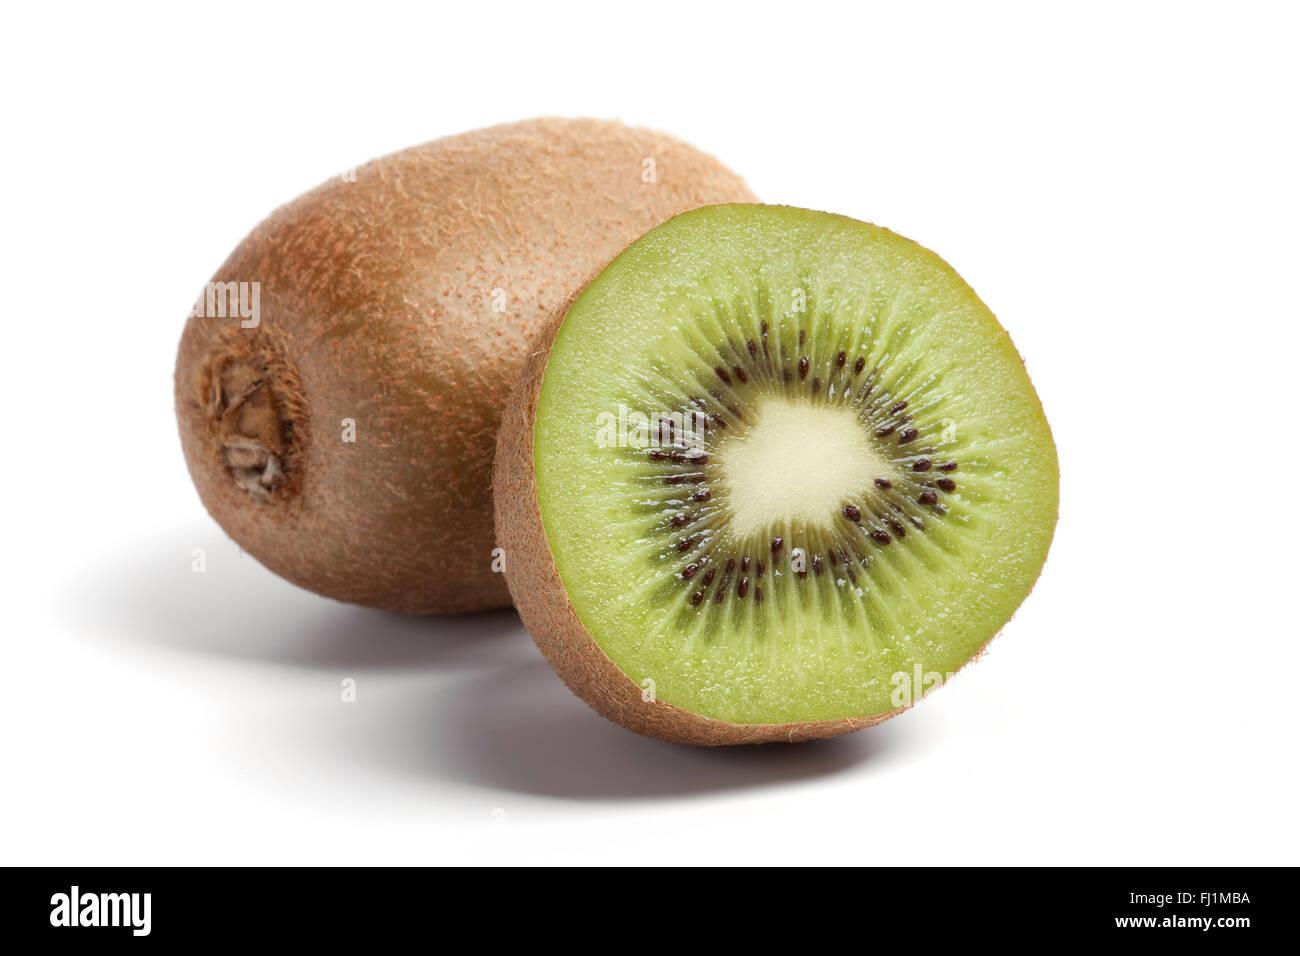 Fresh ripe one and a half kiwi on white background - Stock Image